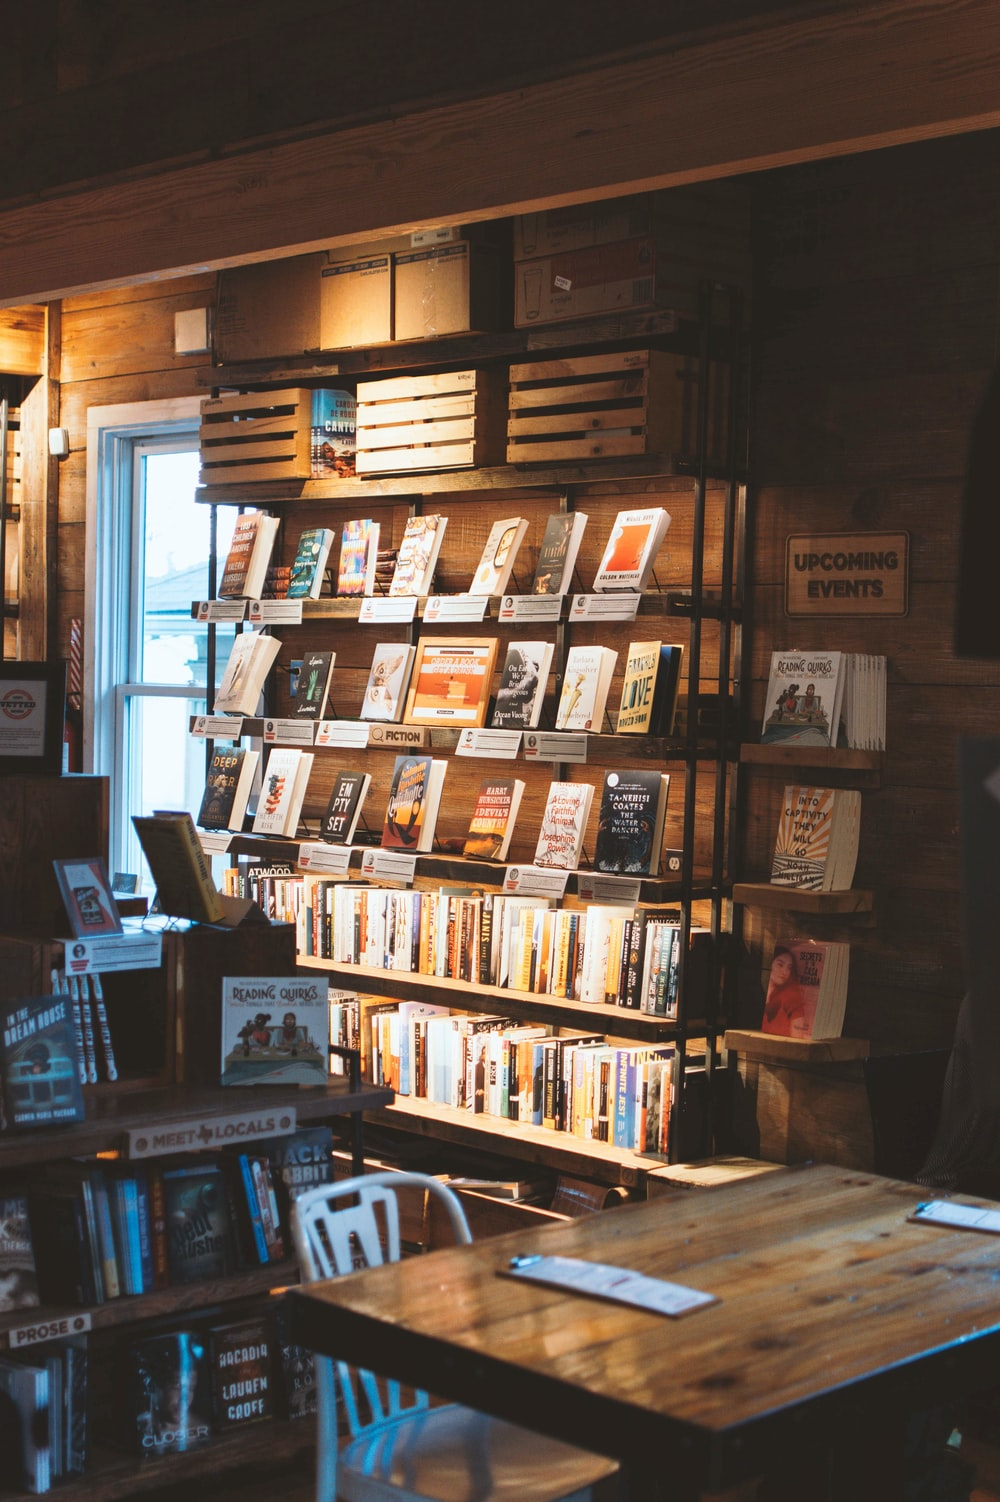 book display in dim room